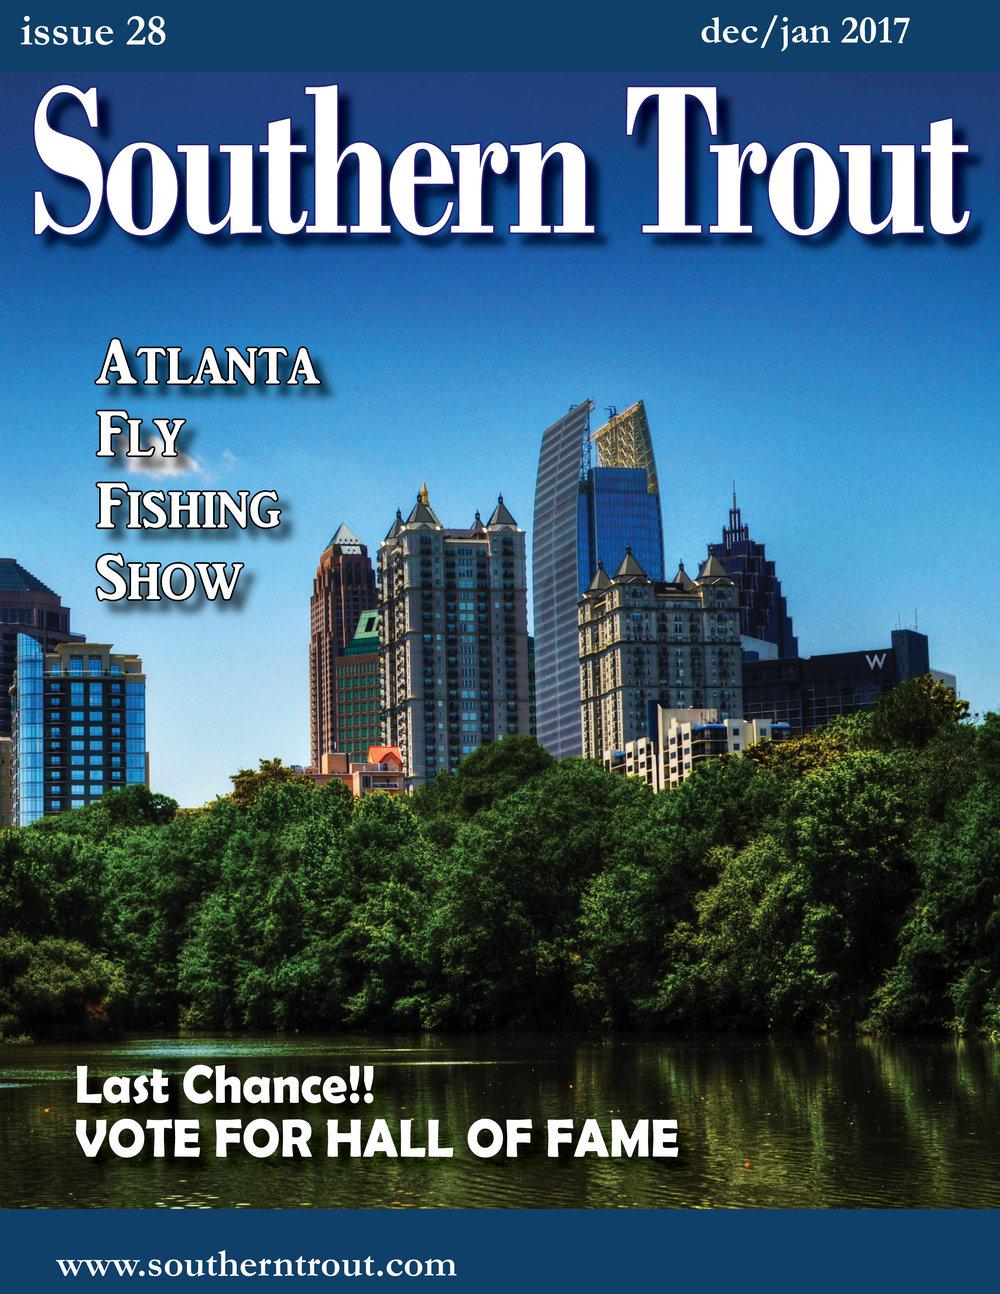 Issue 28- Dec/Jan 2017